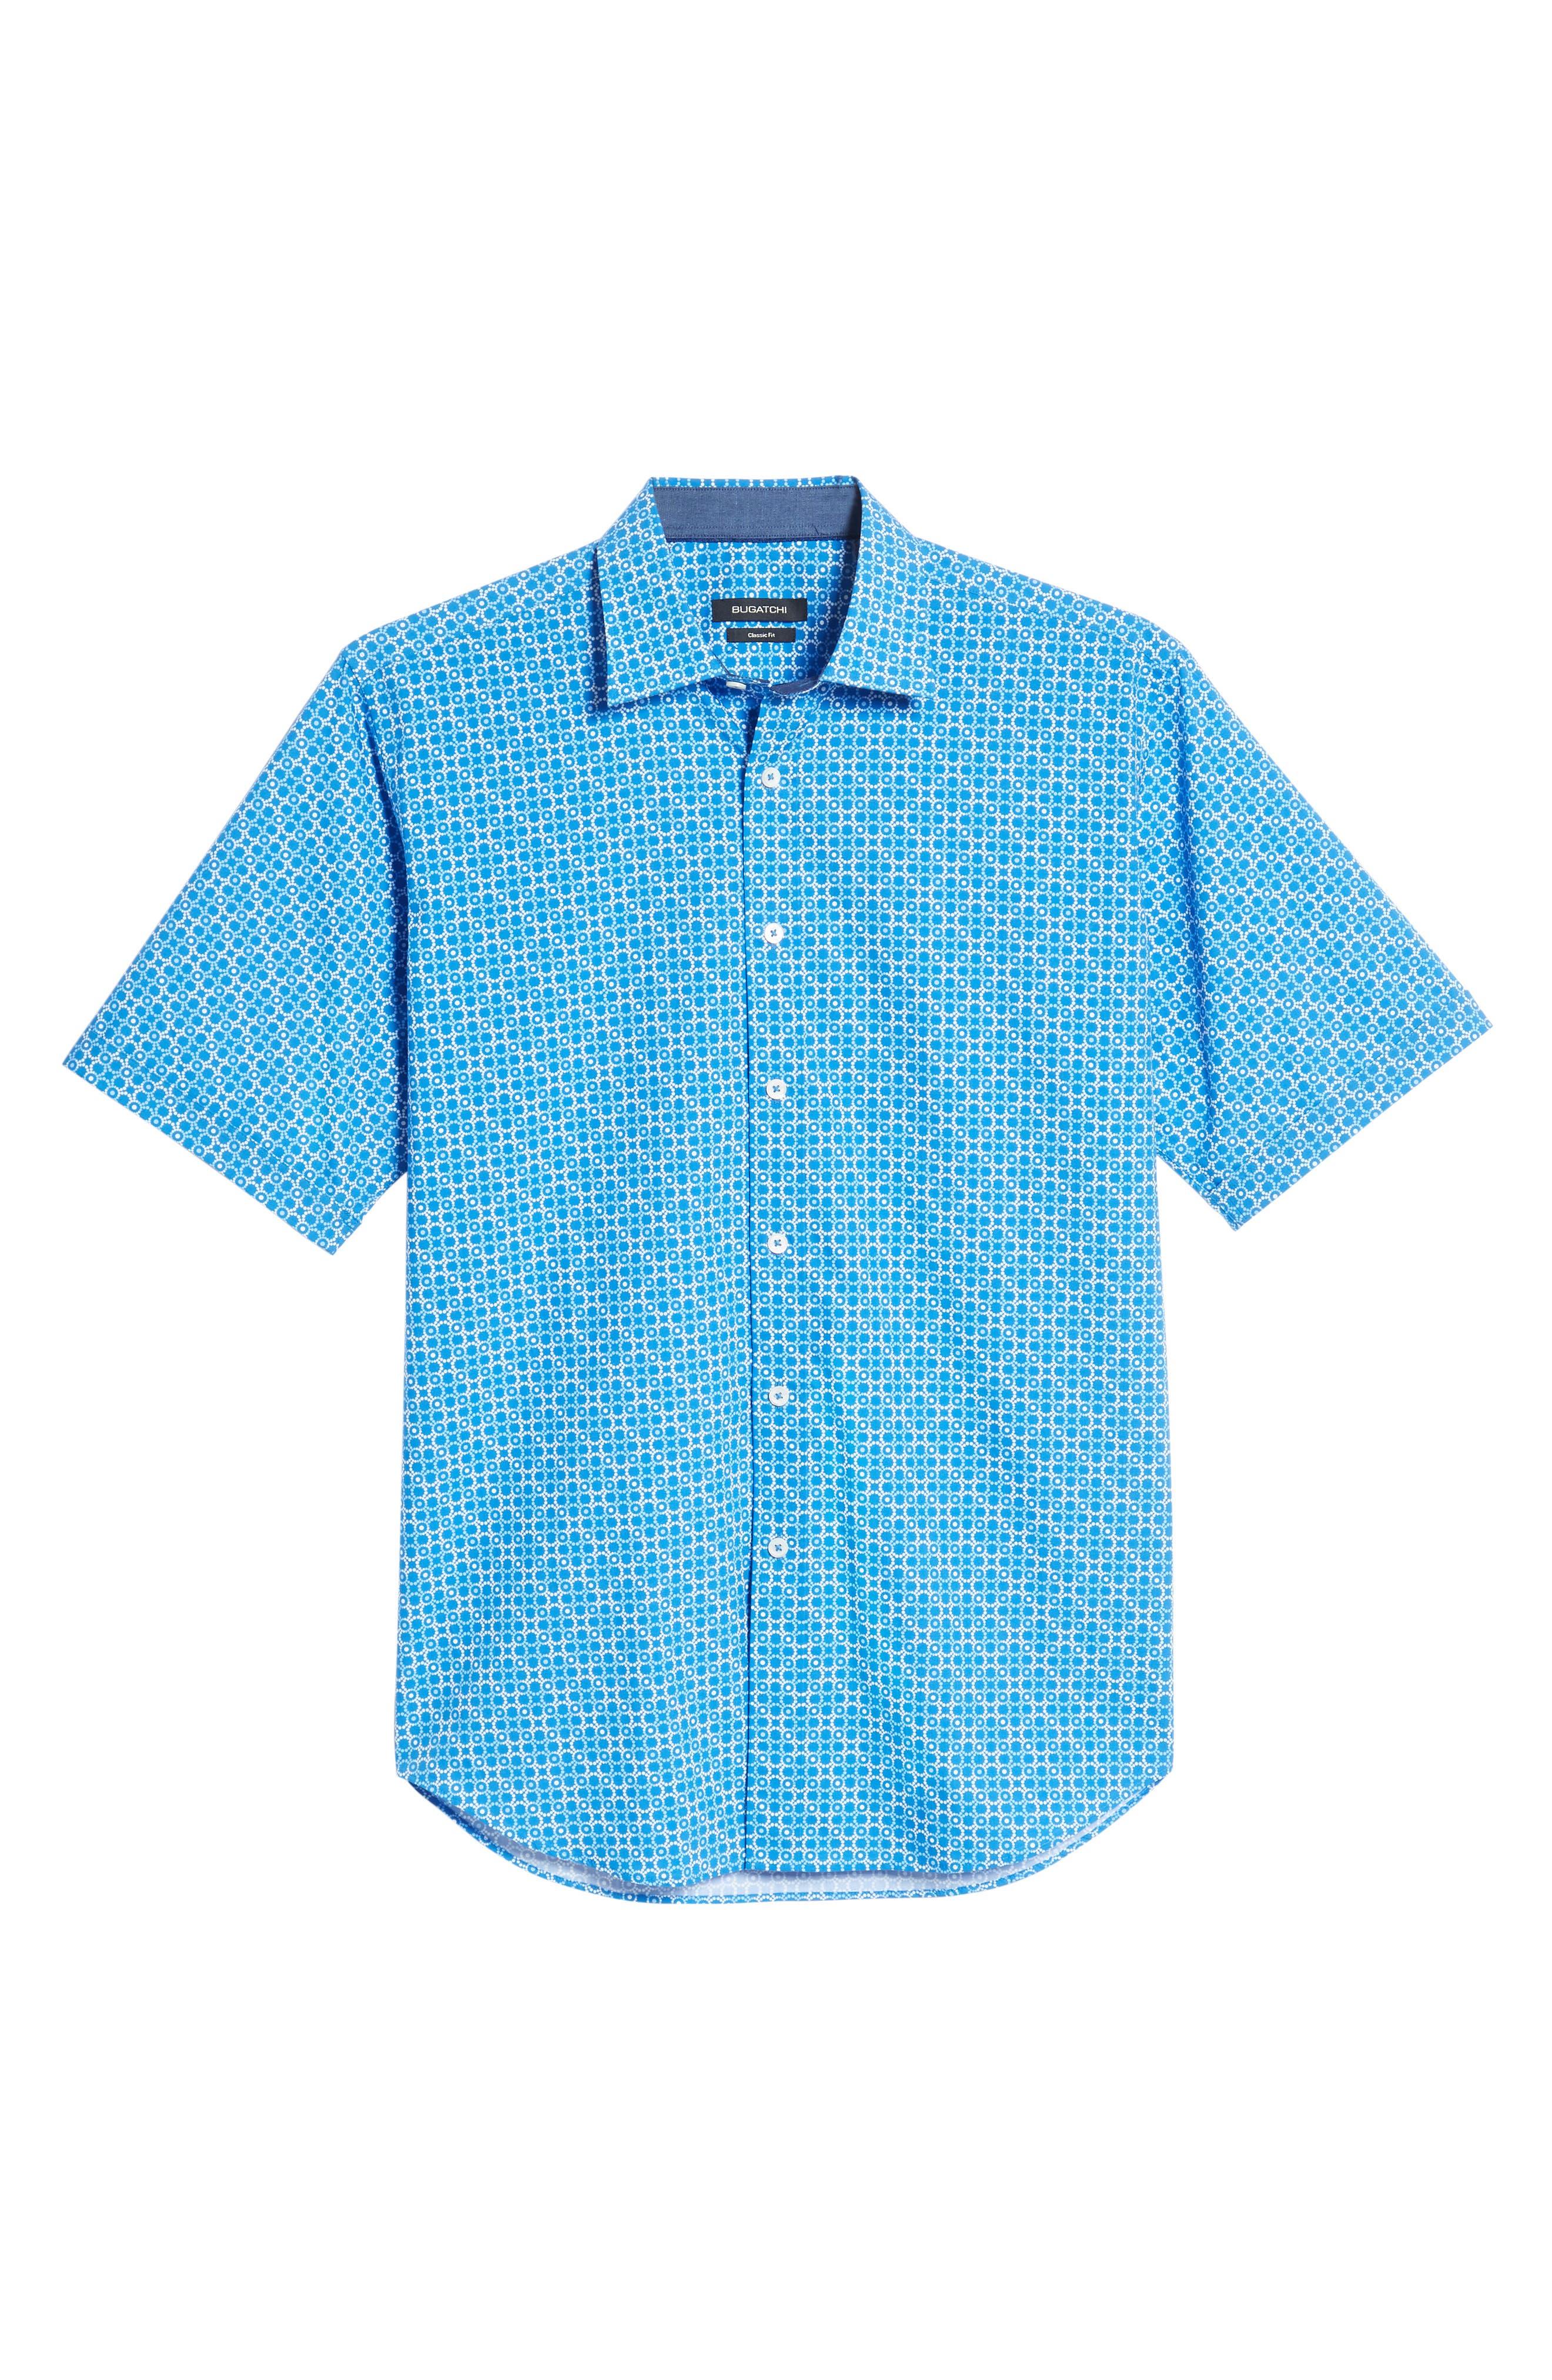 Classic Fit Circle Grid Sport Shirt,                             Alternate thumbnail 6, color,                             Classic Blue